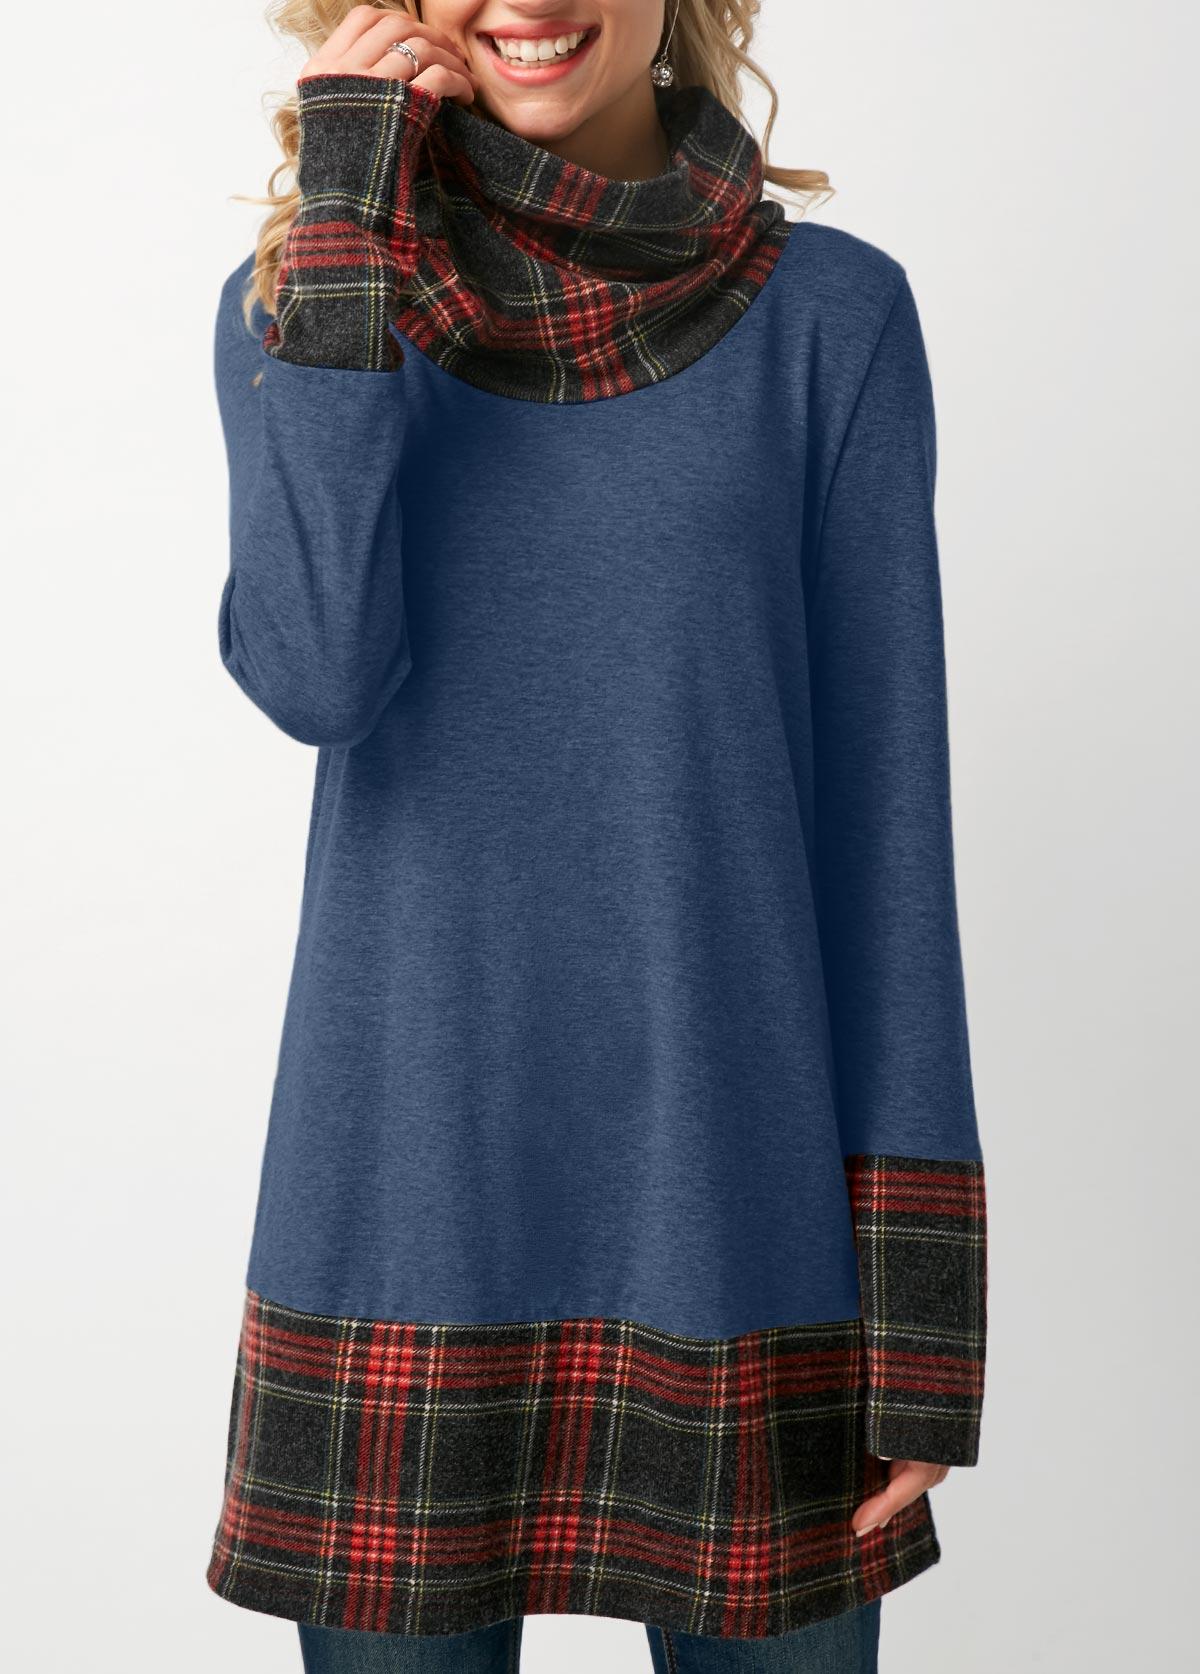 ROTITA Long Sleeve Cowl Neck Patchwork Plaid T Shirt